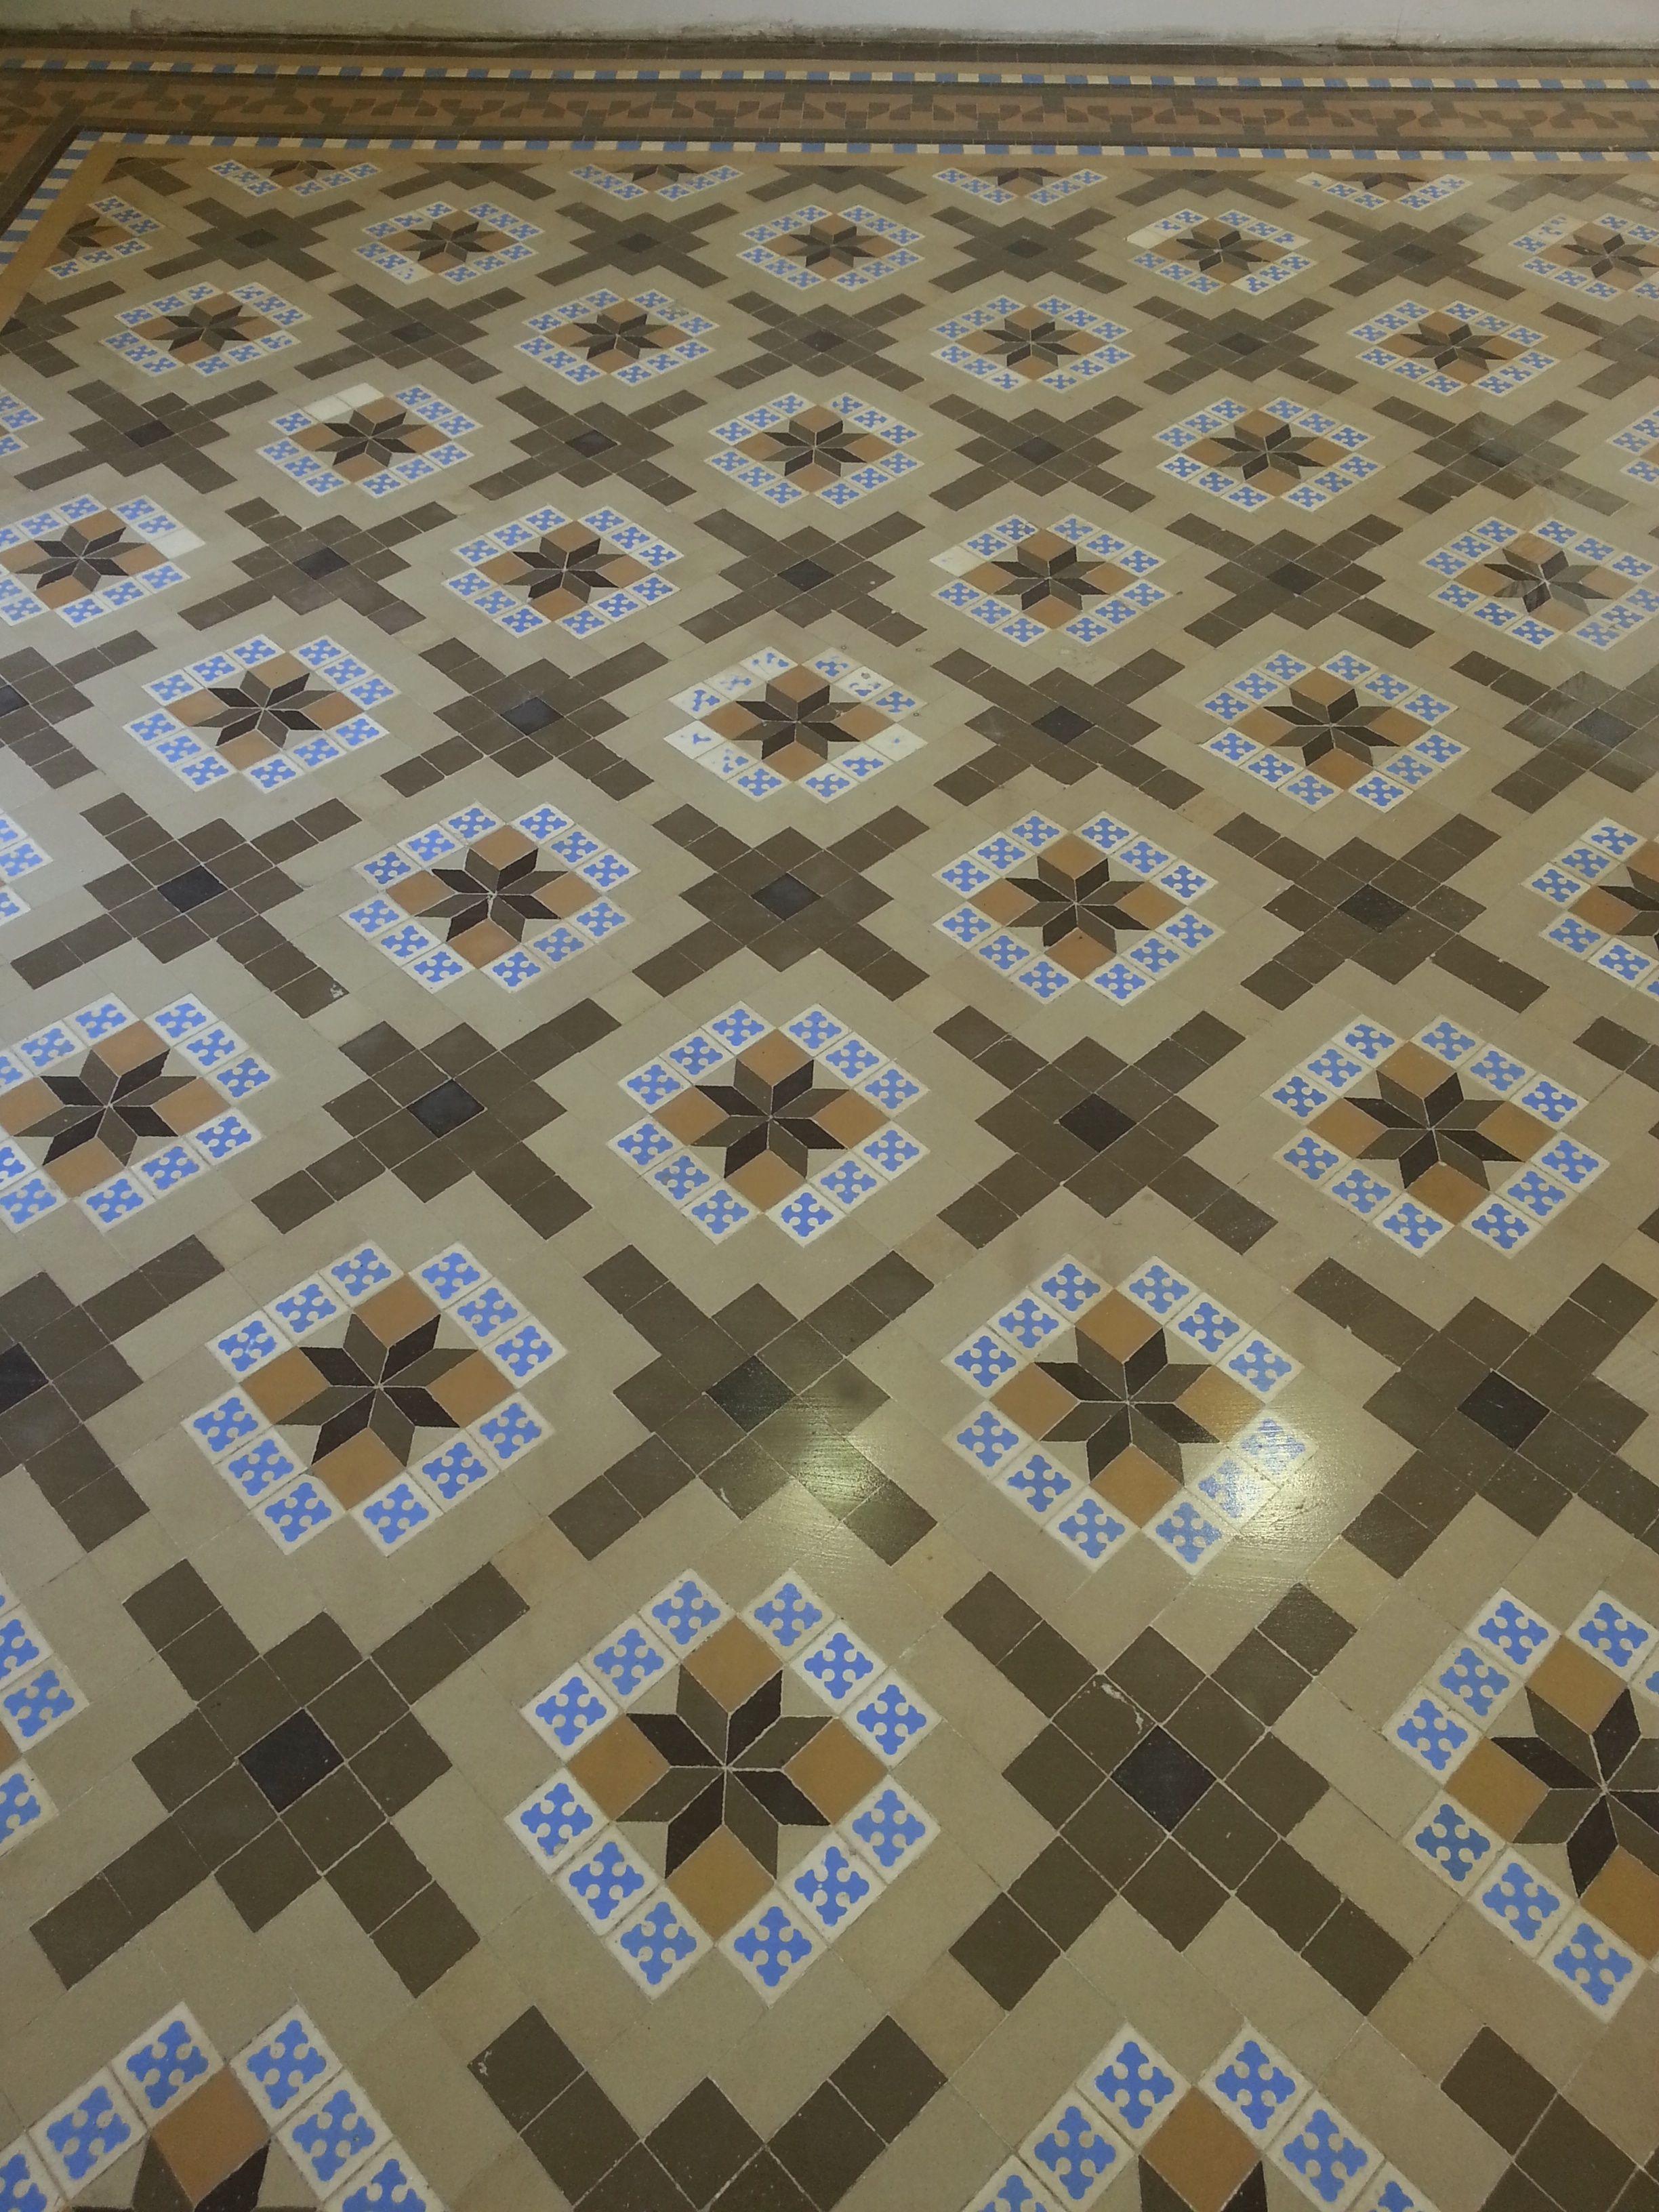 pavimento de mosaico de Nolla morednista